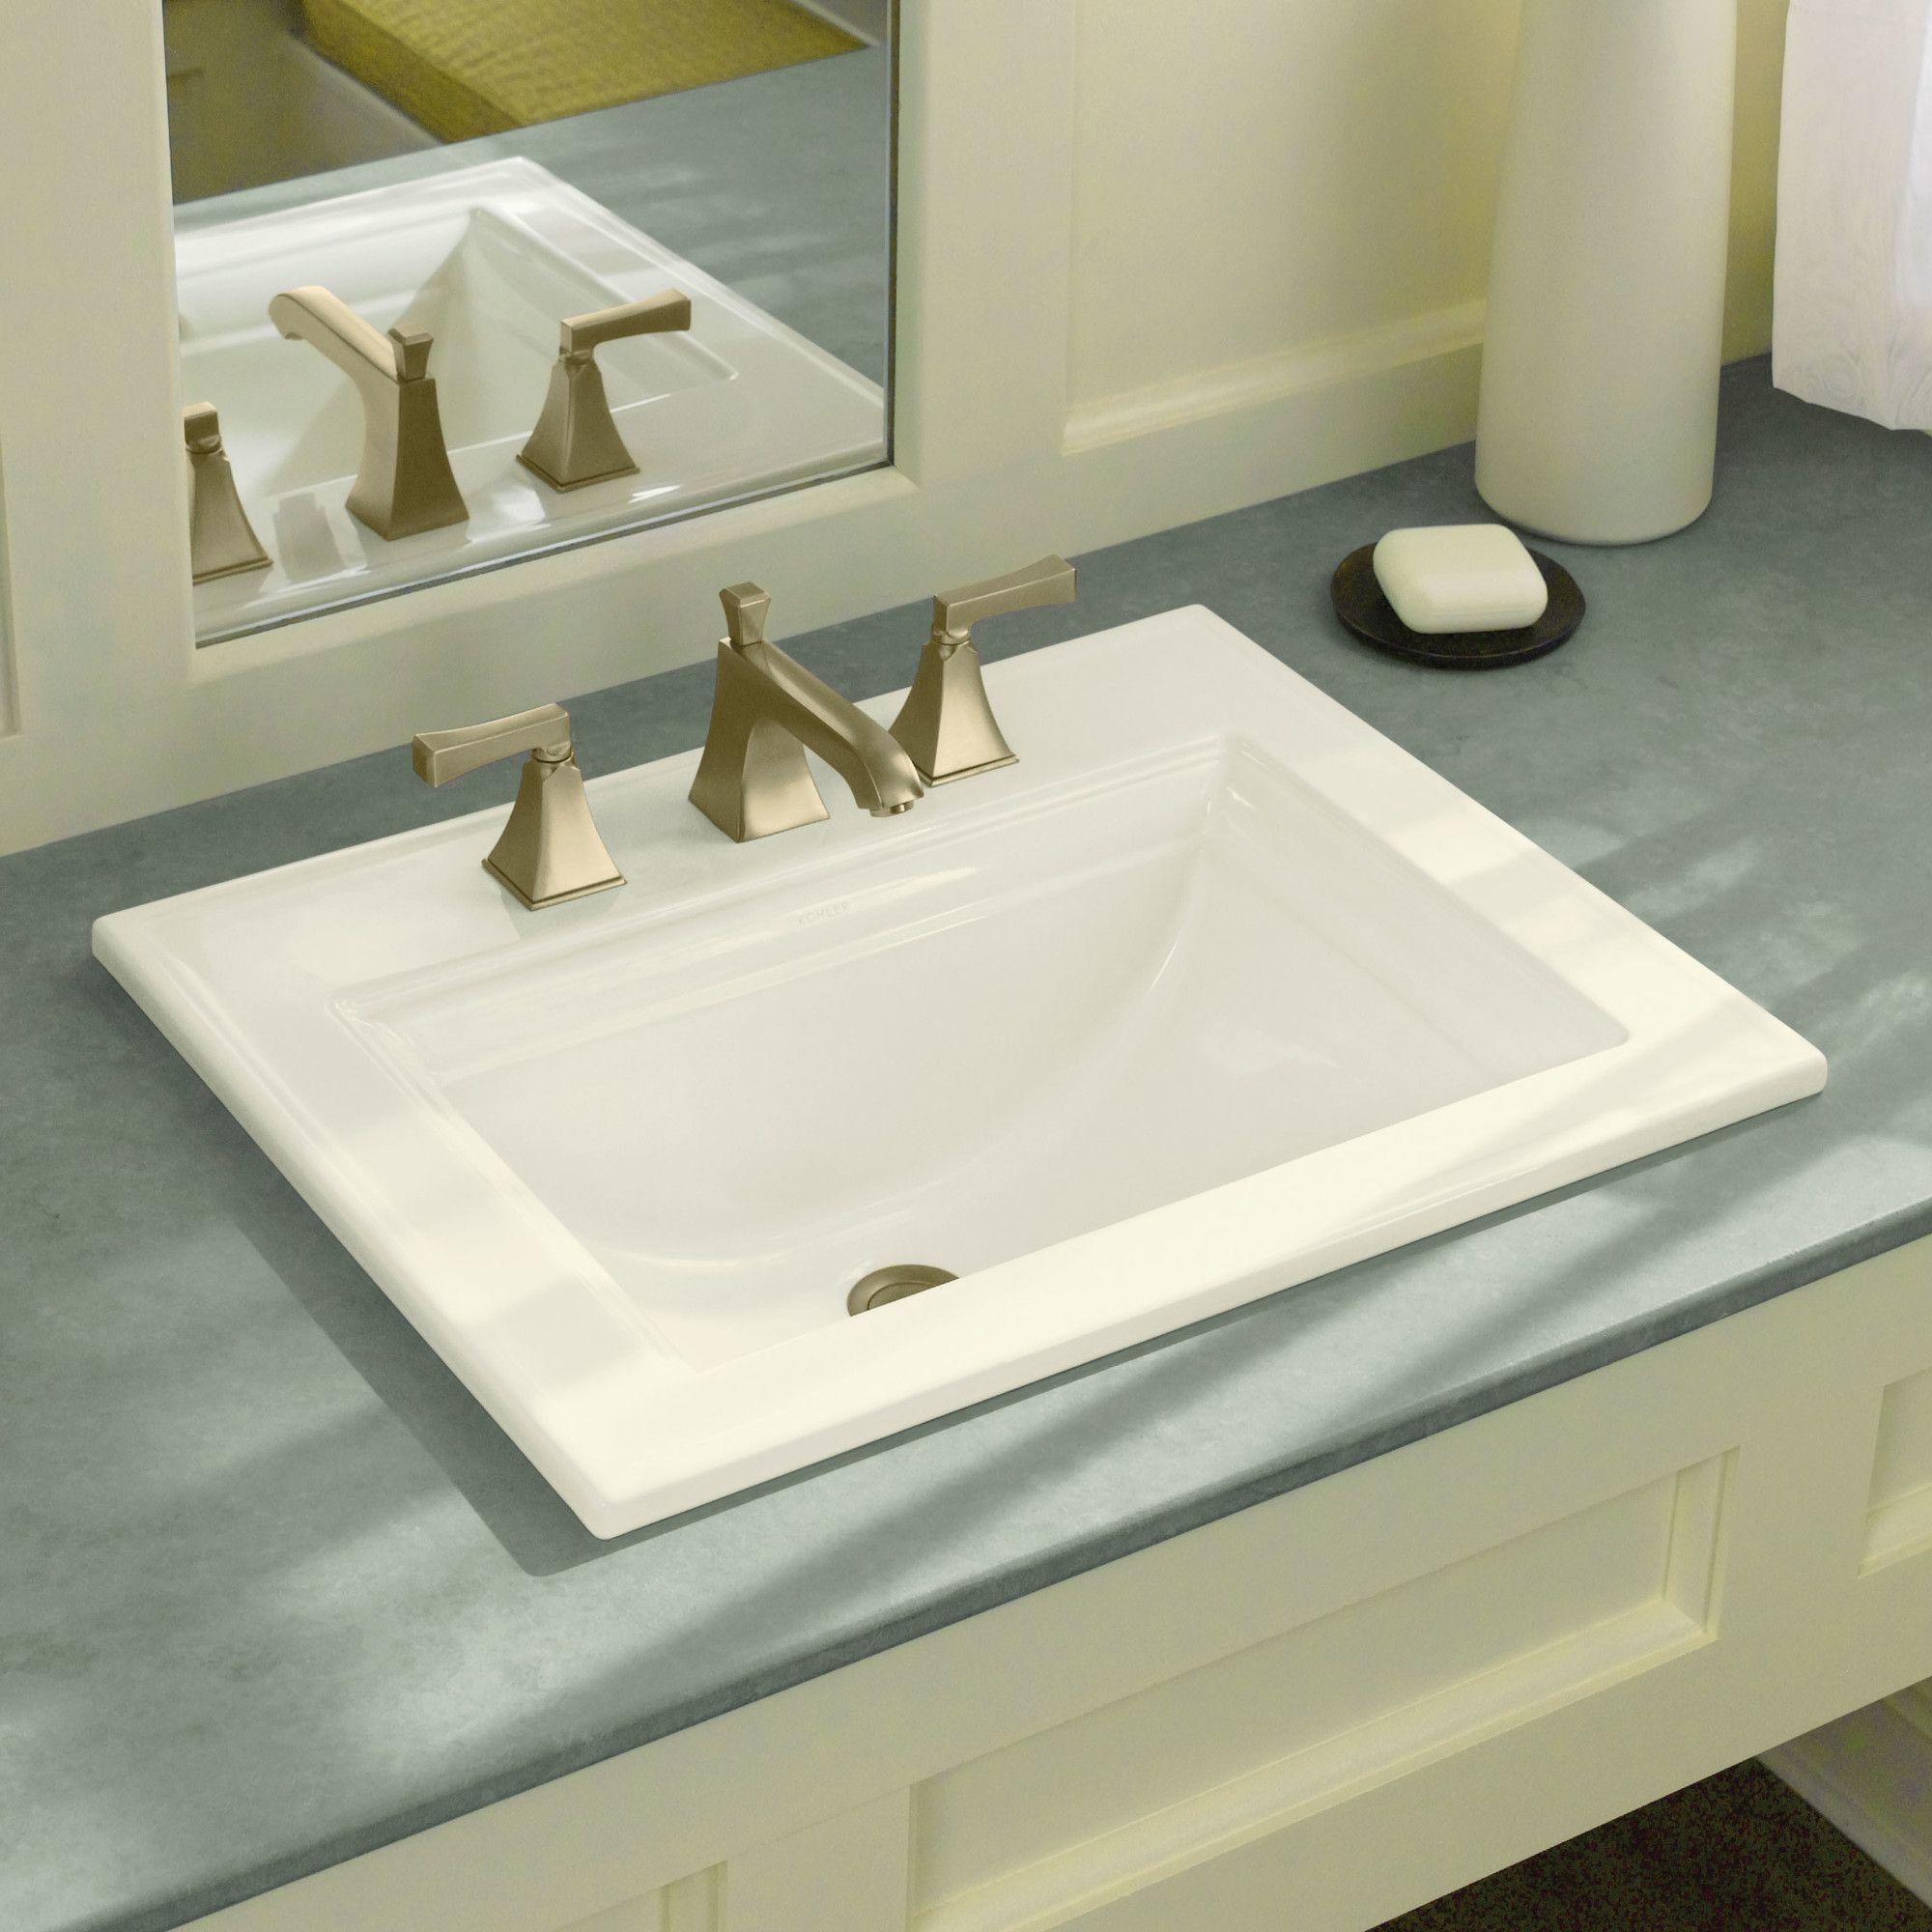 Memoirs® Ceramic Rectangular Drop-In Bathroom Sink with Overflow ...